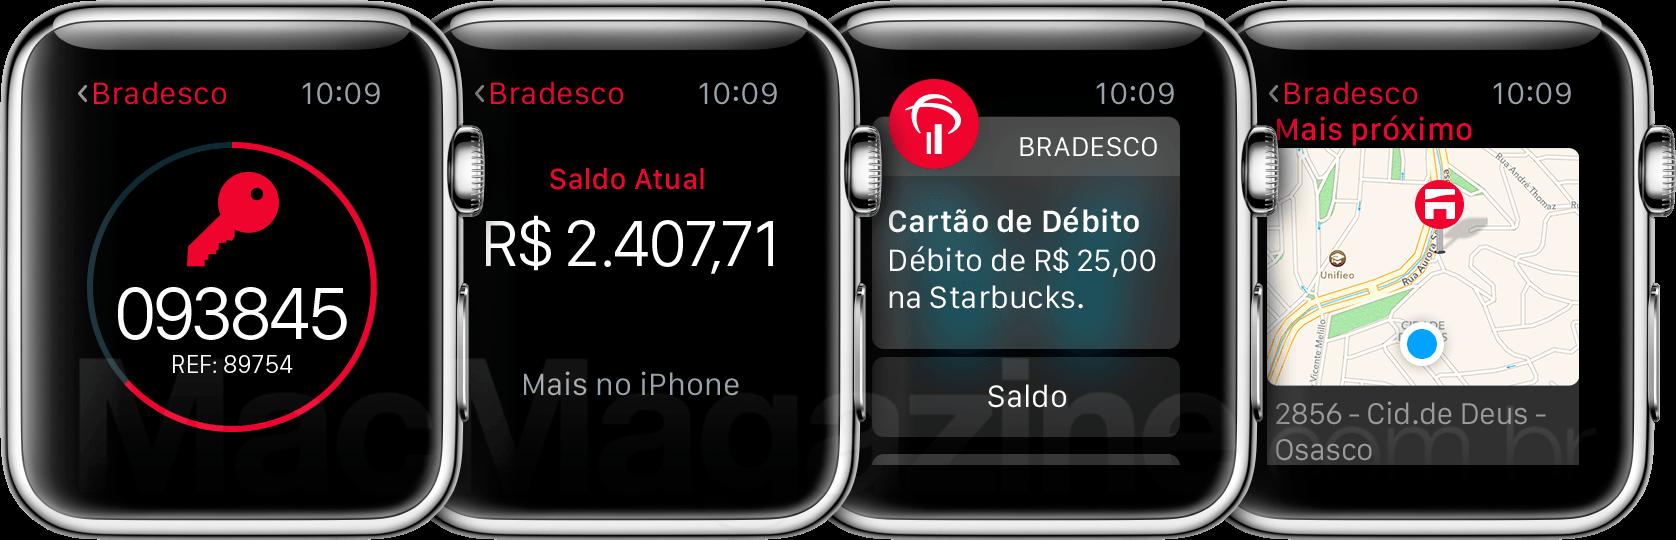 Banco Bradesco for Apple Watch